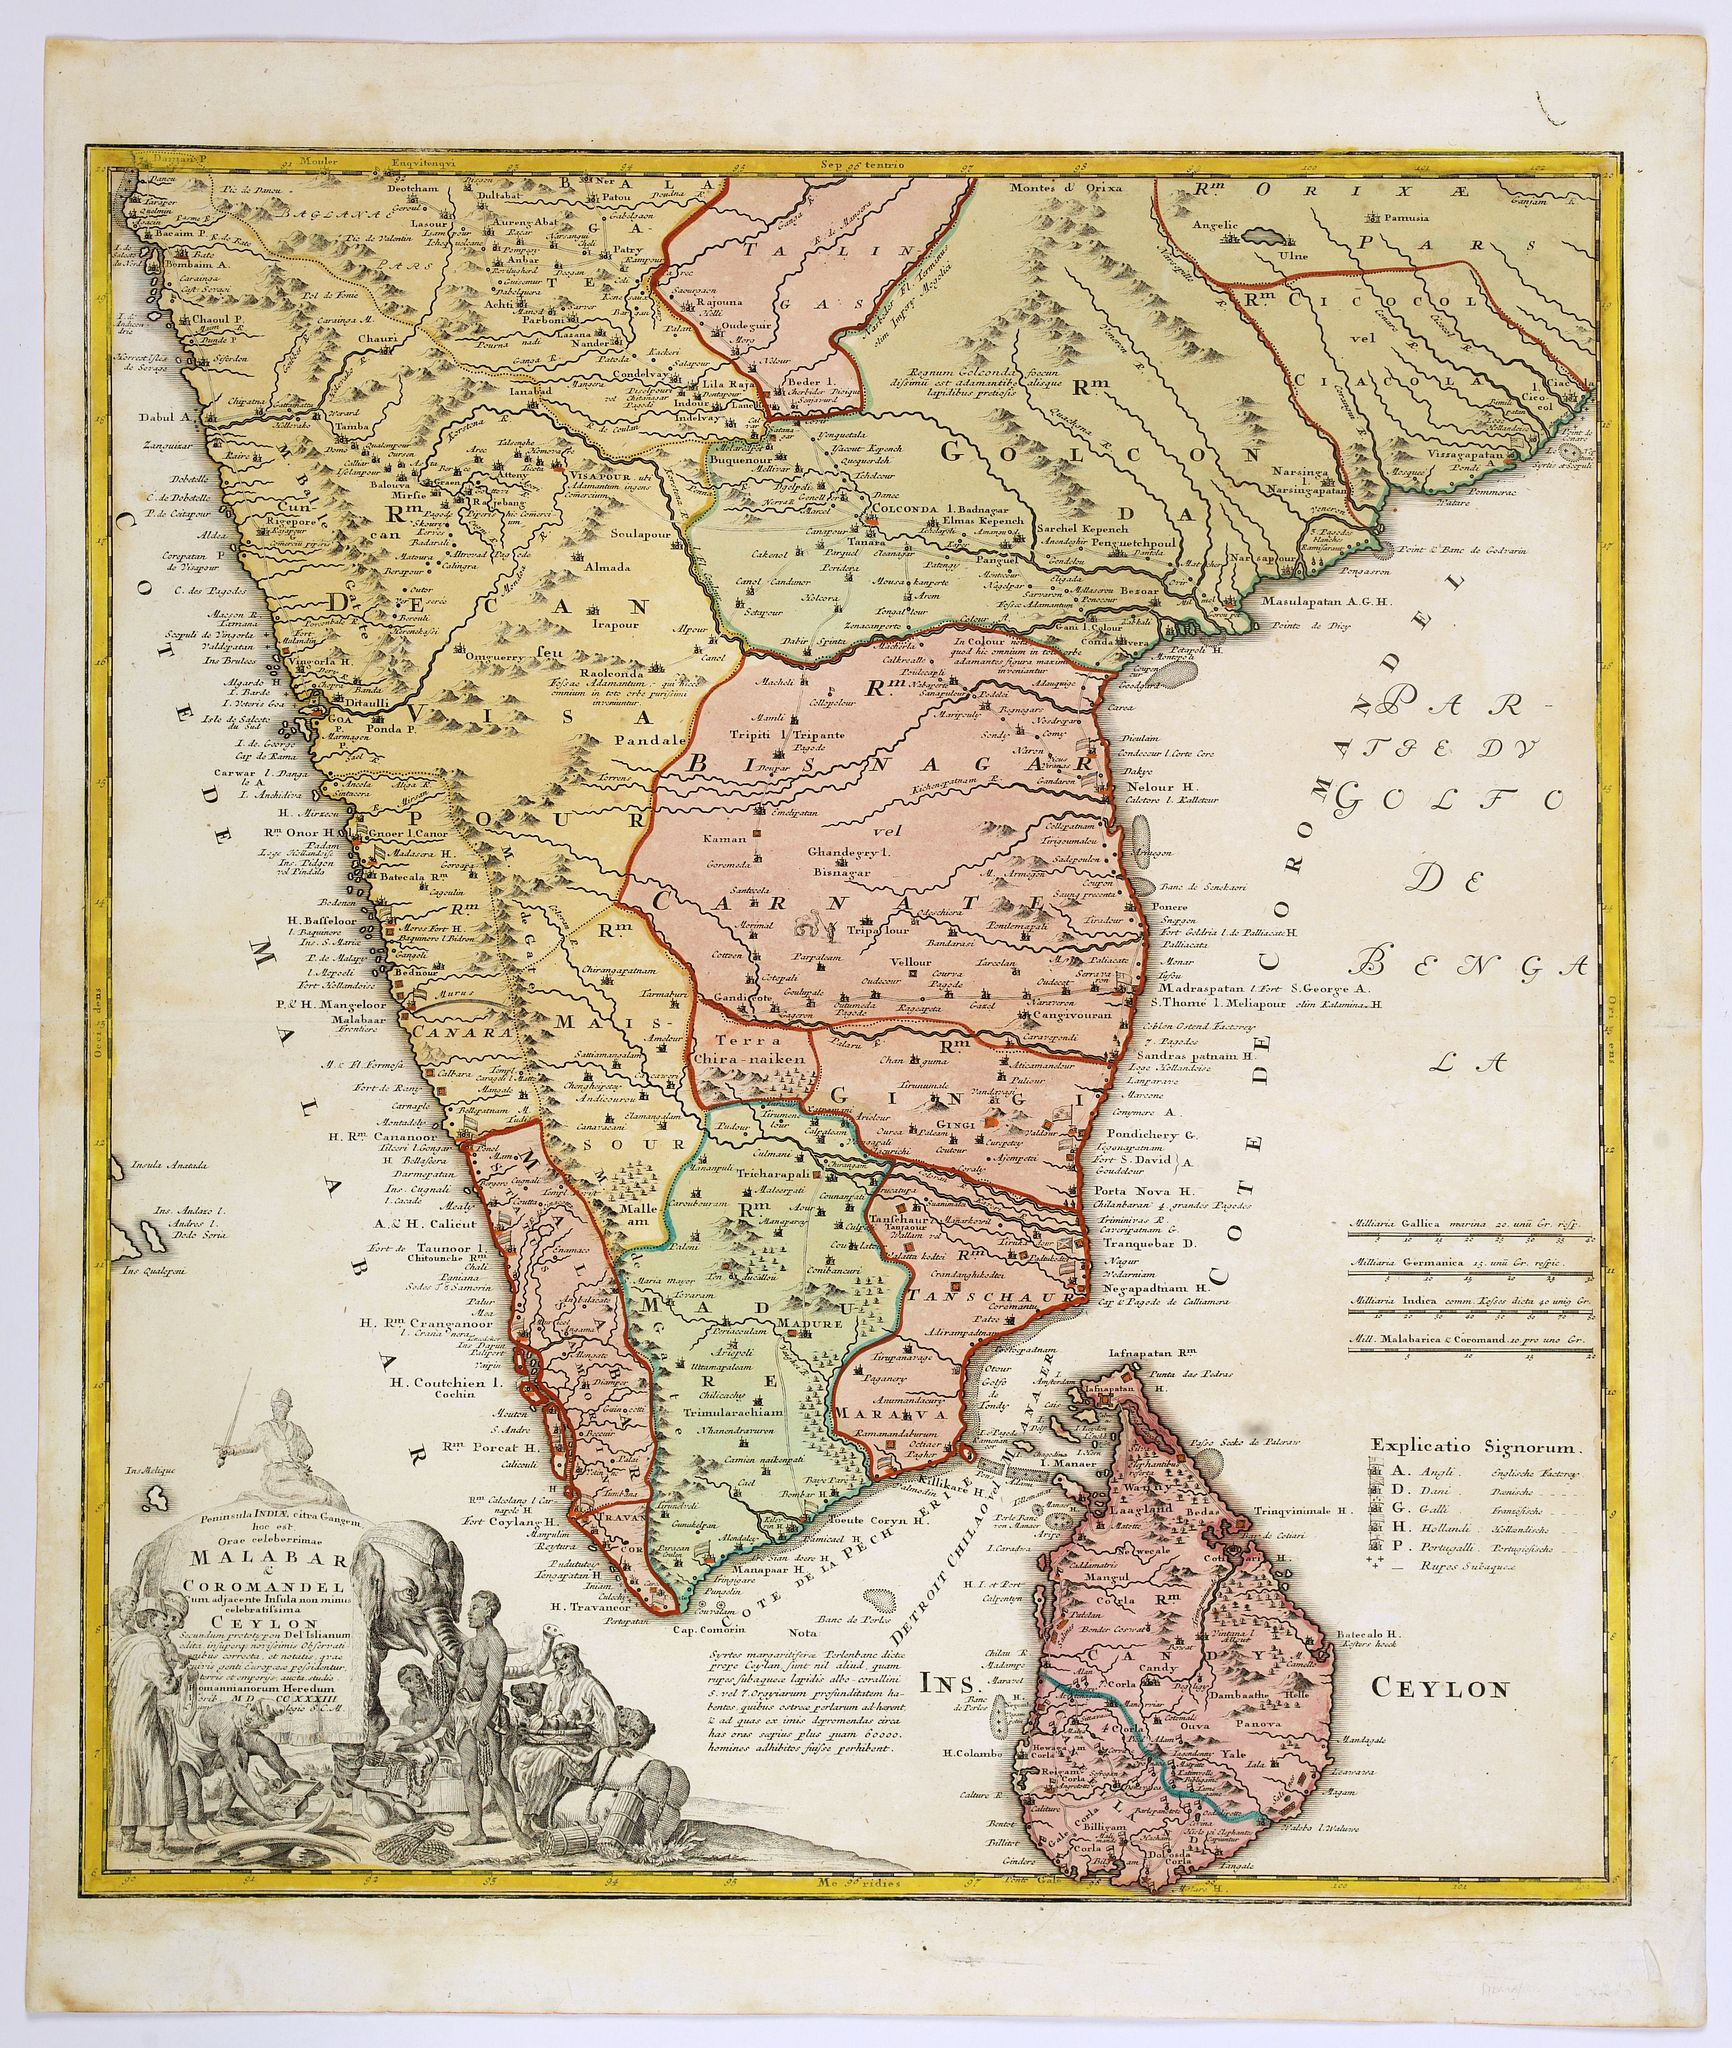 HOMANN HEIRS. - Peninsula Indiae Malabar Coromandel Ceylon.